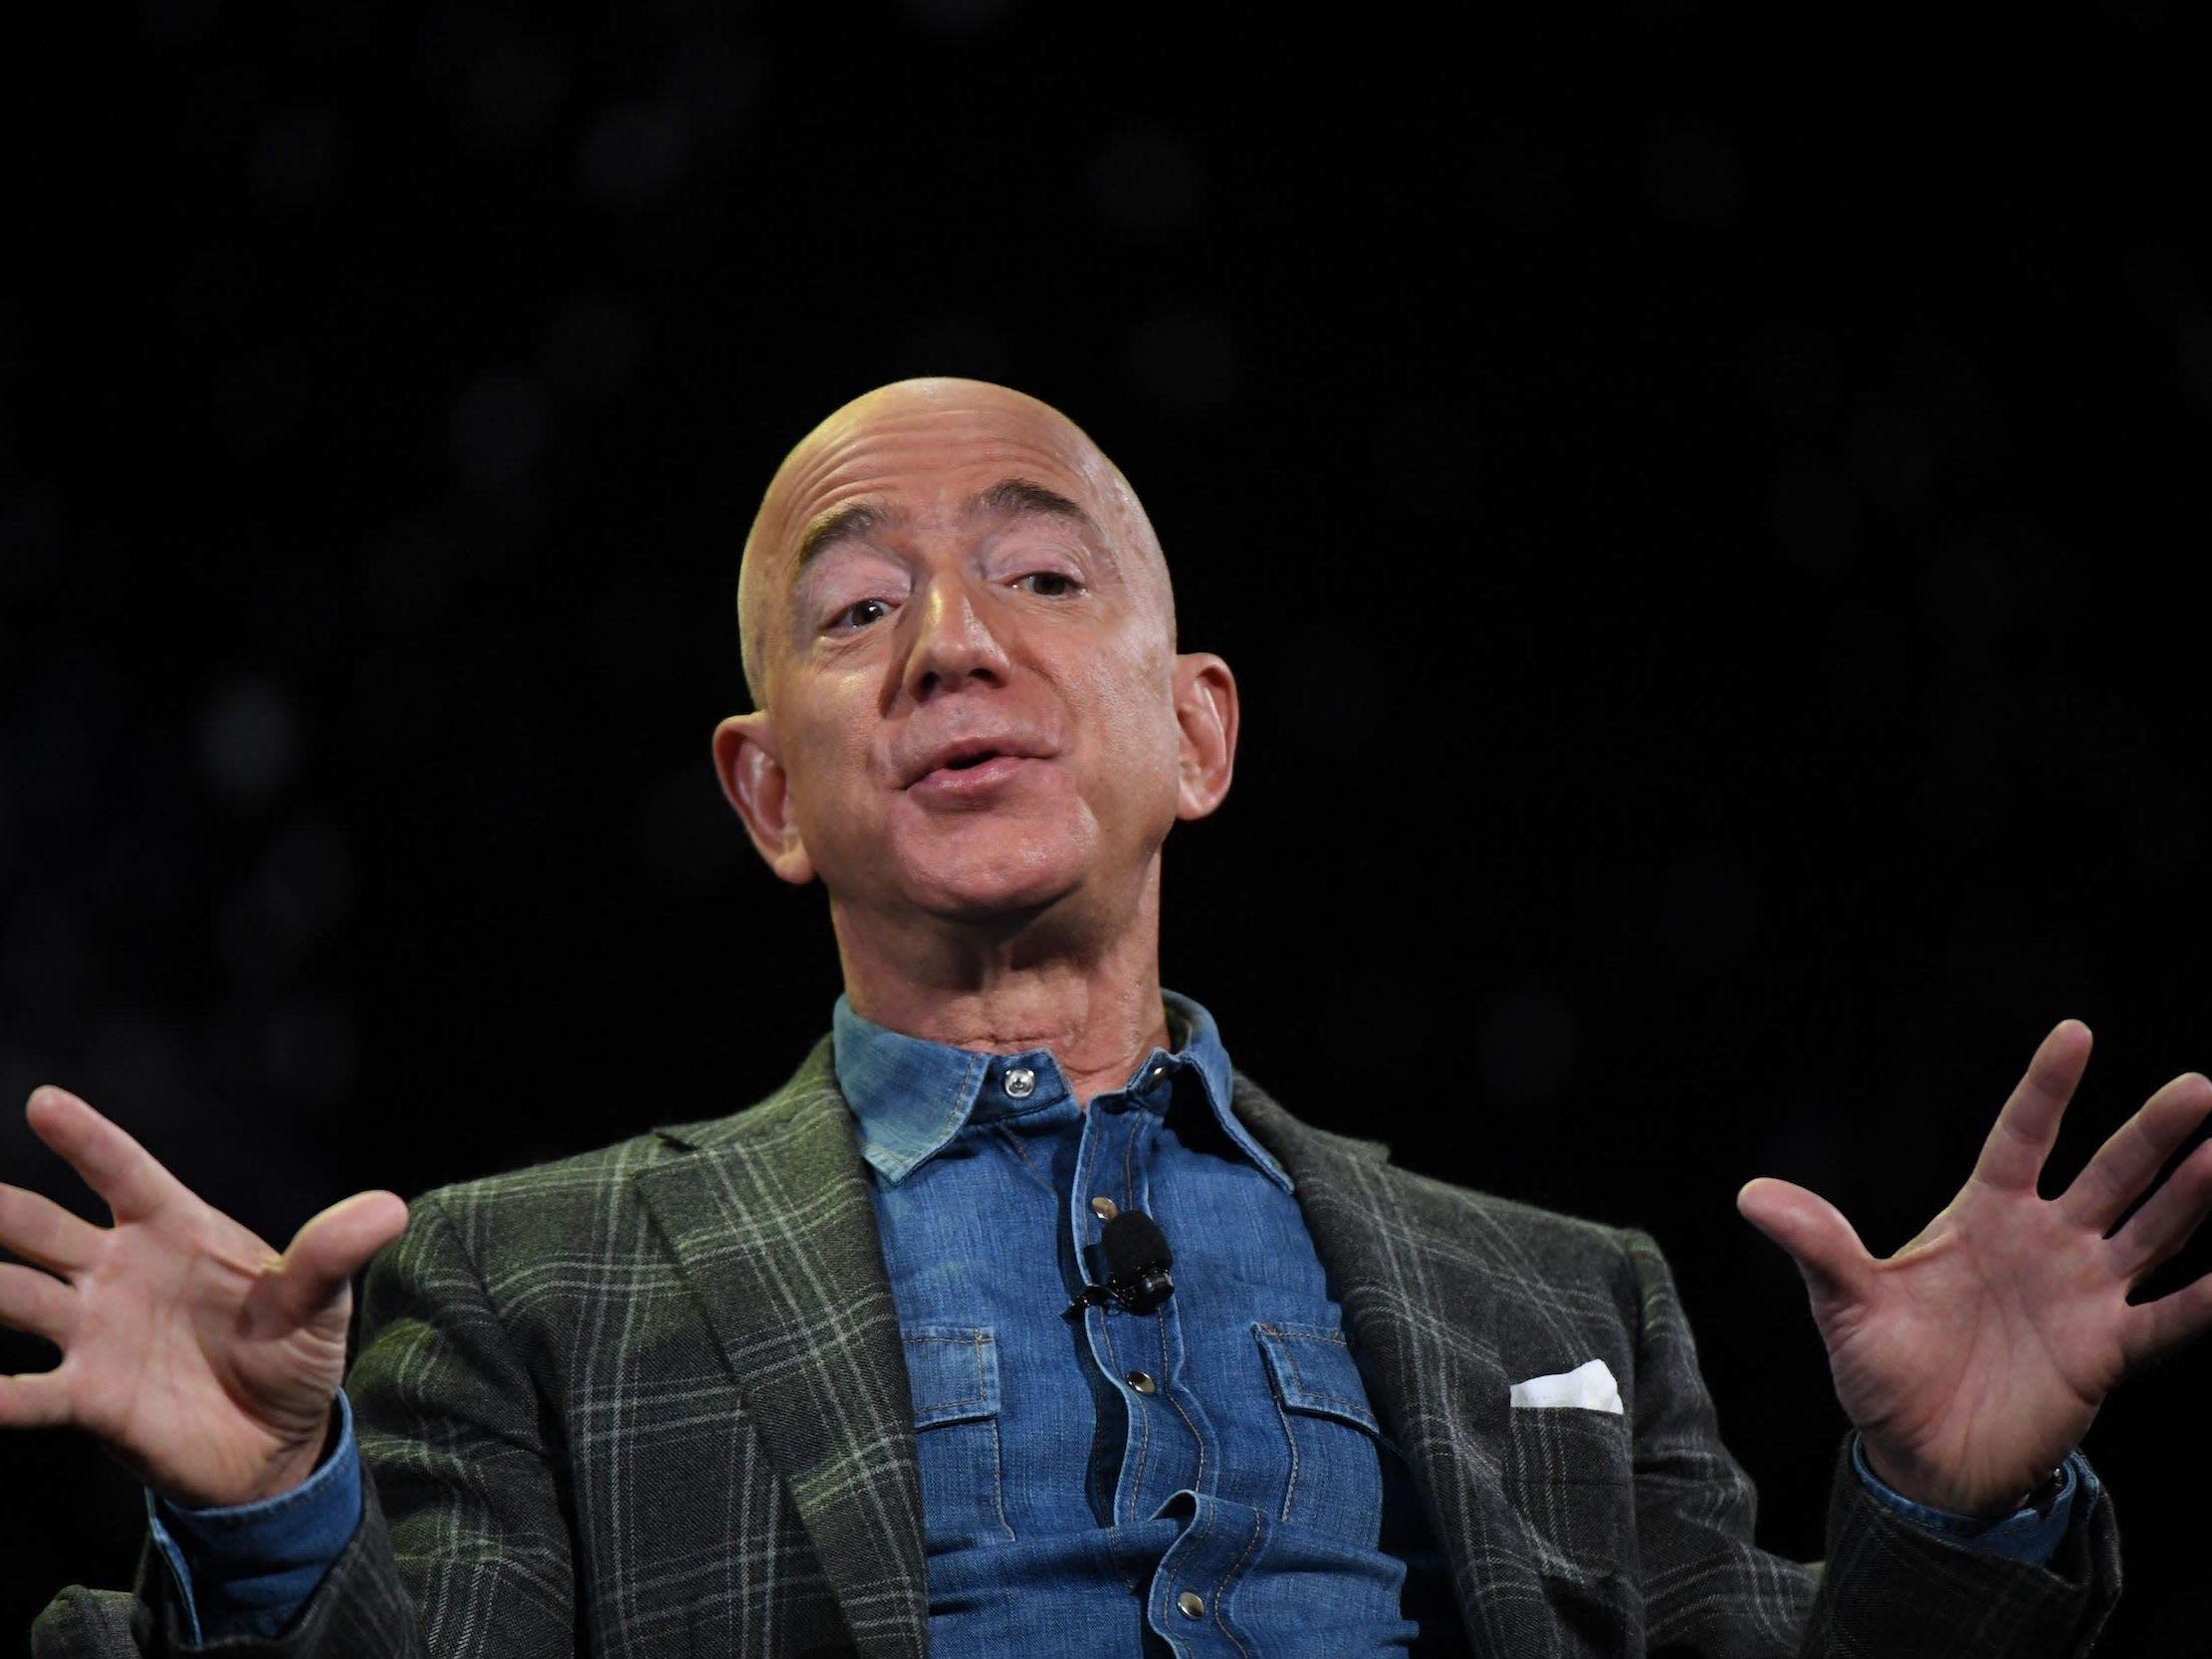 Look at this really big boat that may or may not be Jeff Bezos' new superyacht